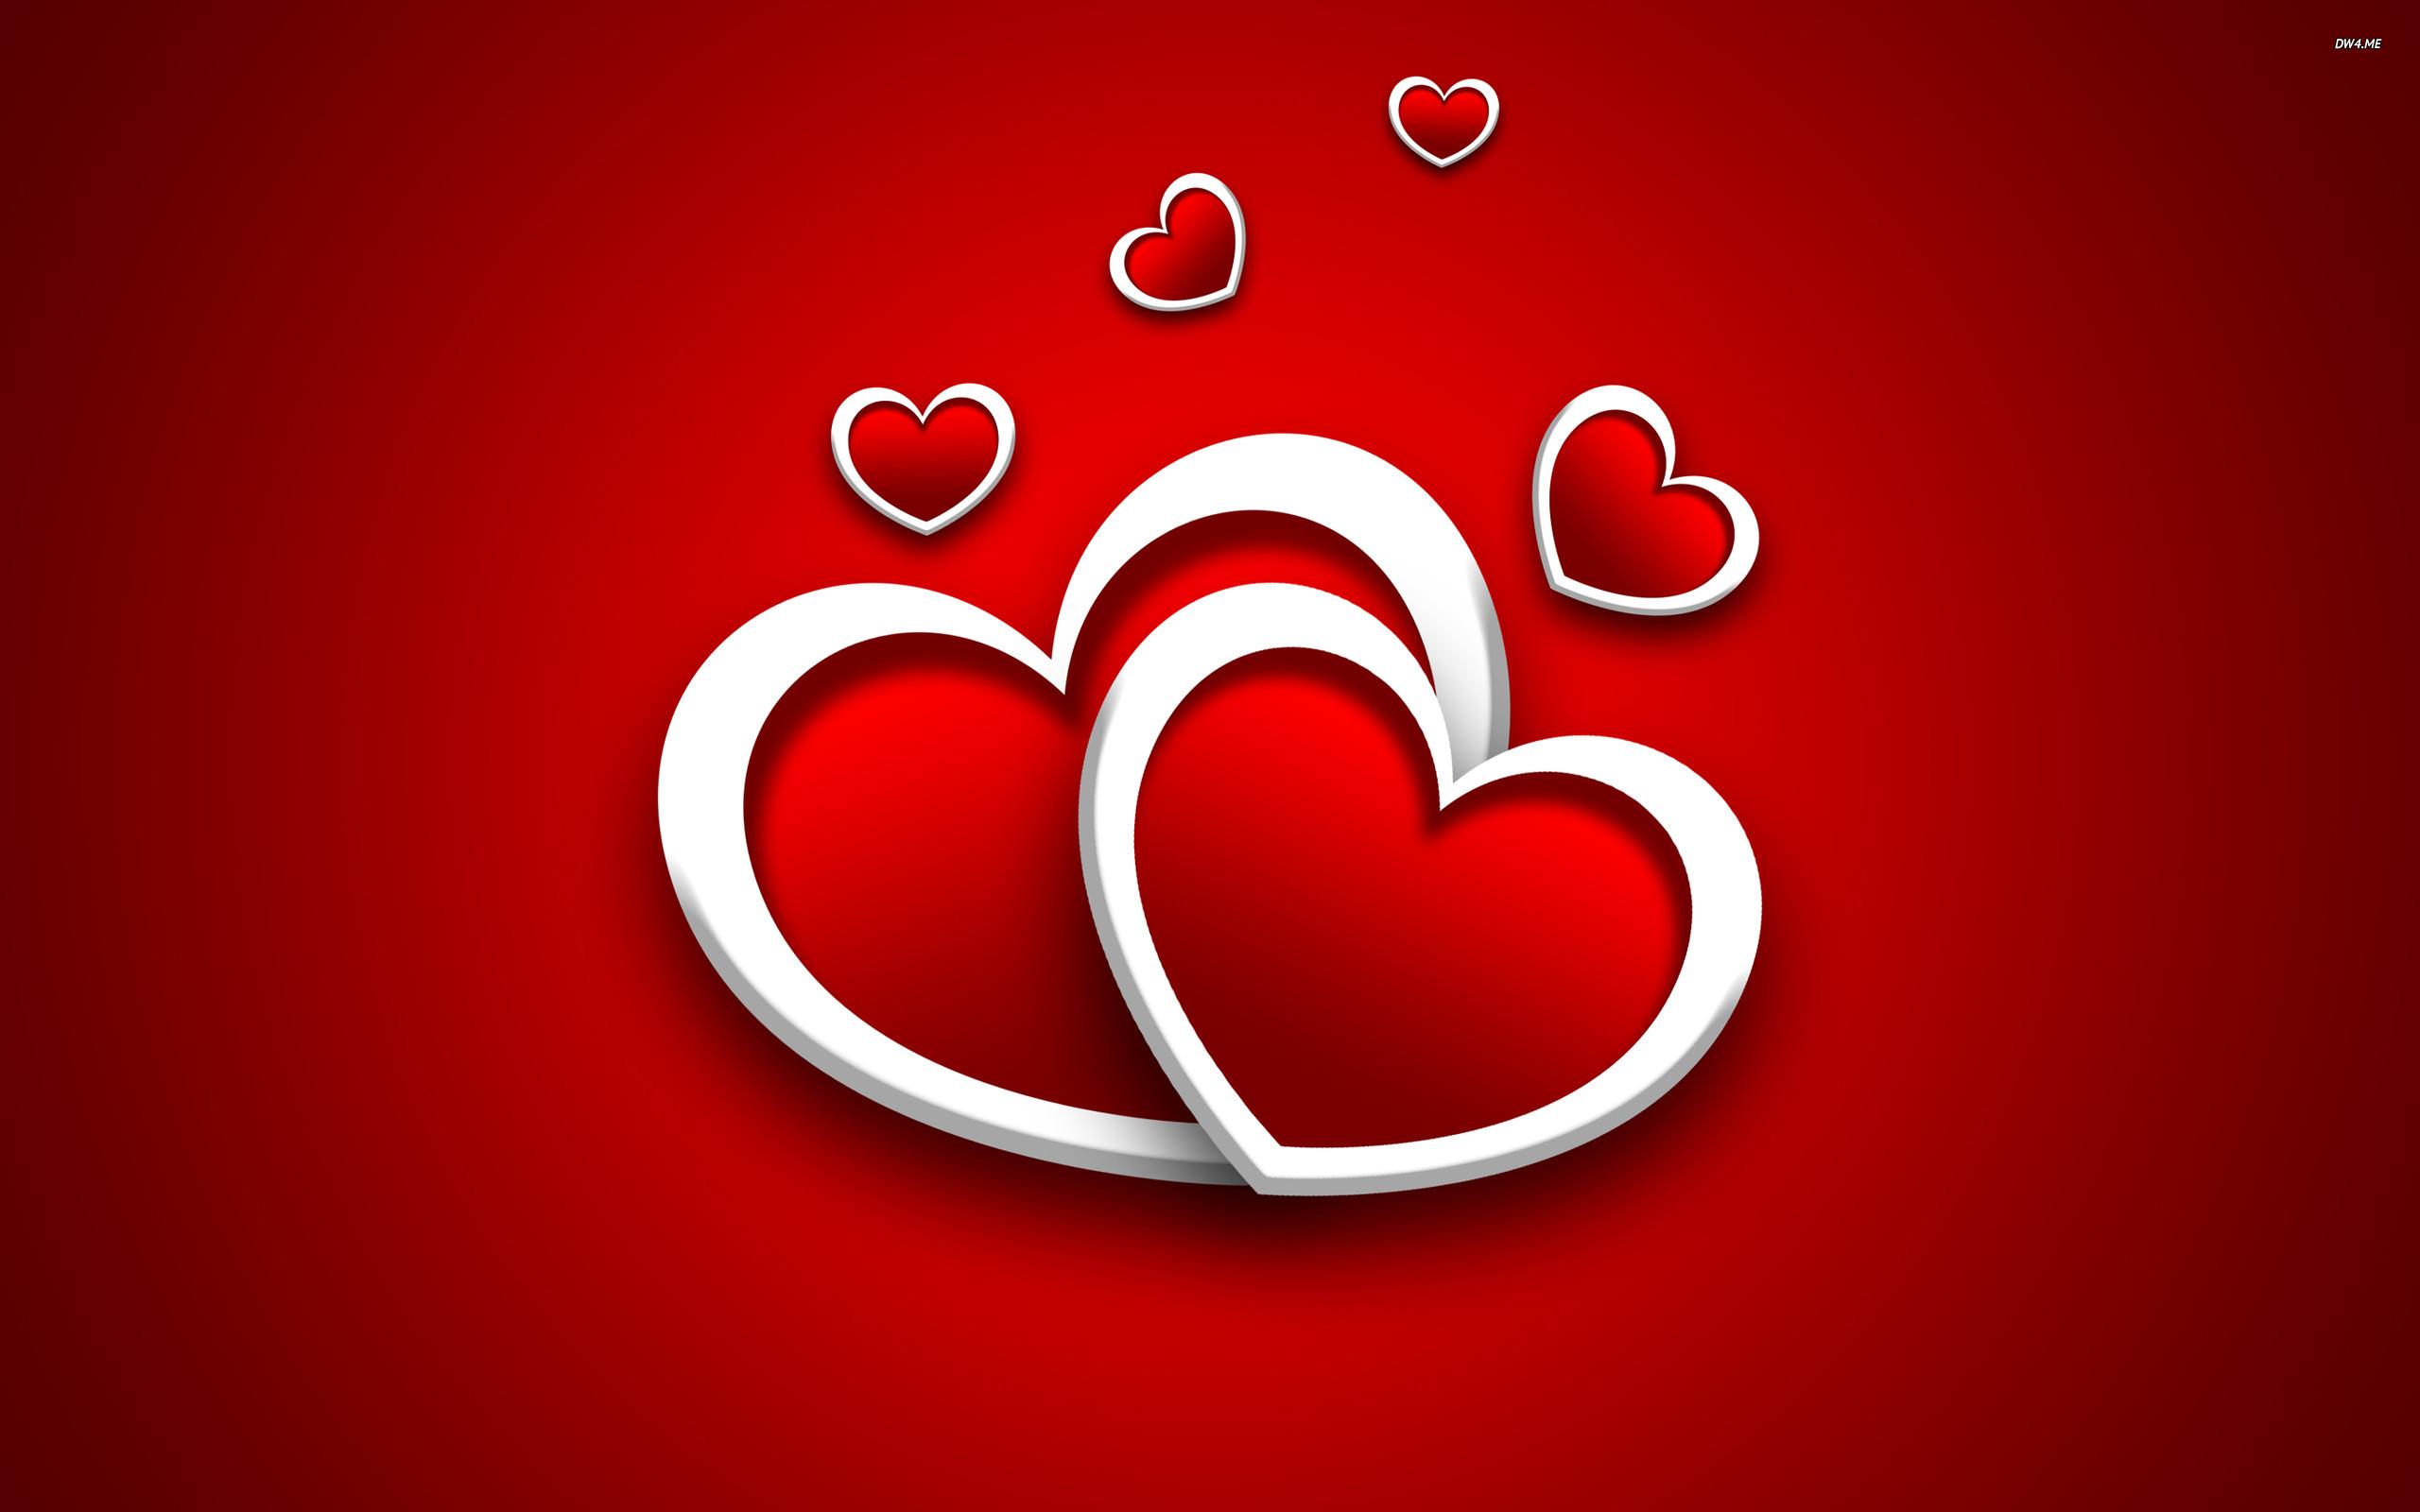 Heart Wallpapers Red Hd Desktop Wallpapers 4k Hd